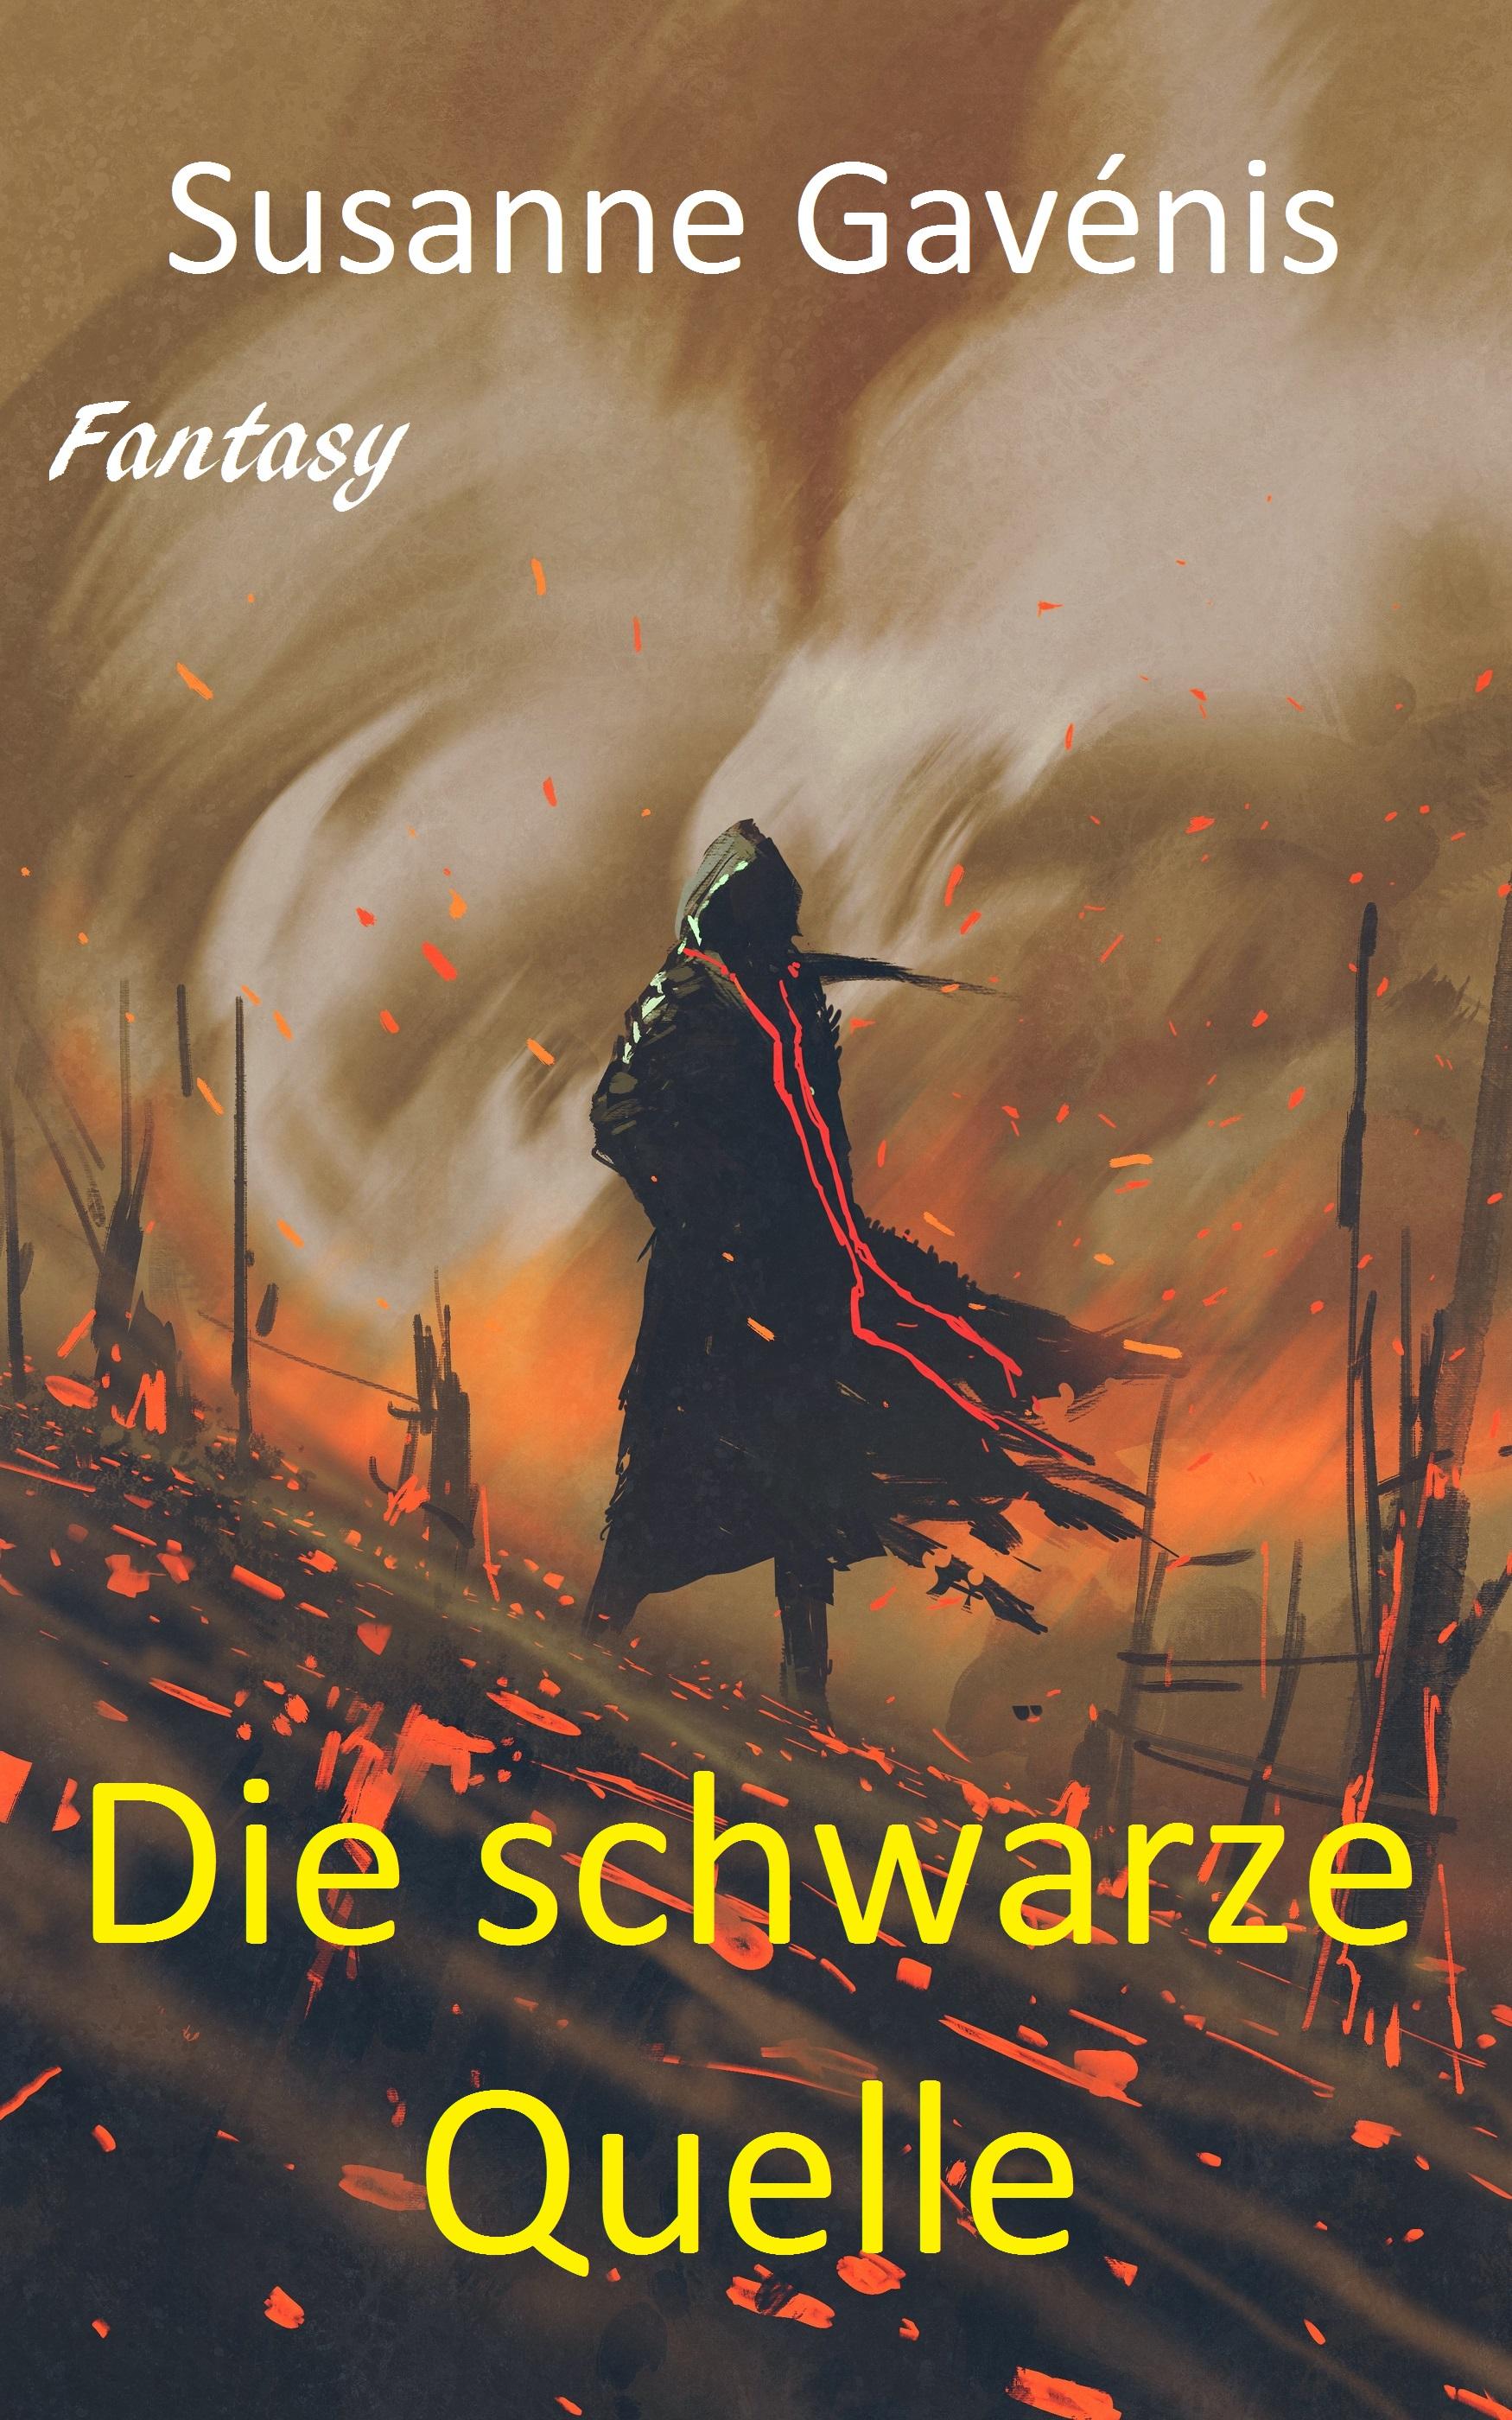 Die schwarze Quelle, Susanne Gavenis Vian_Cover_Final